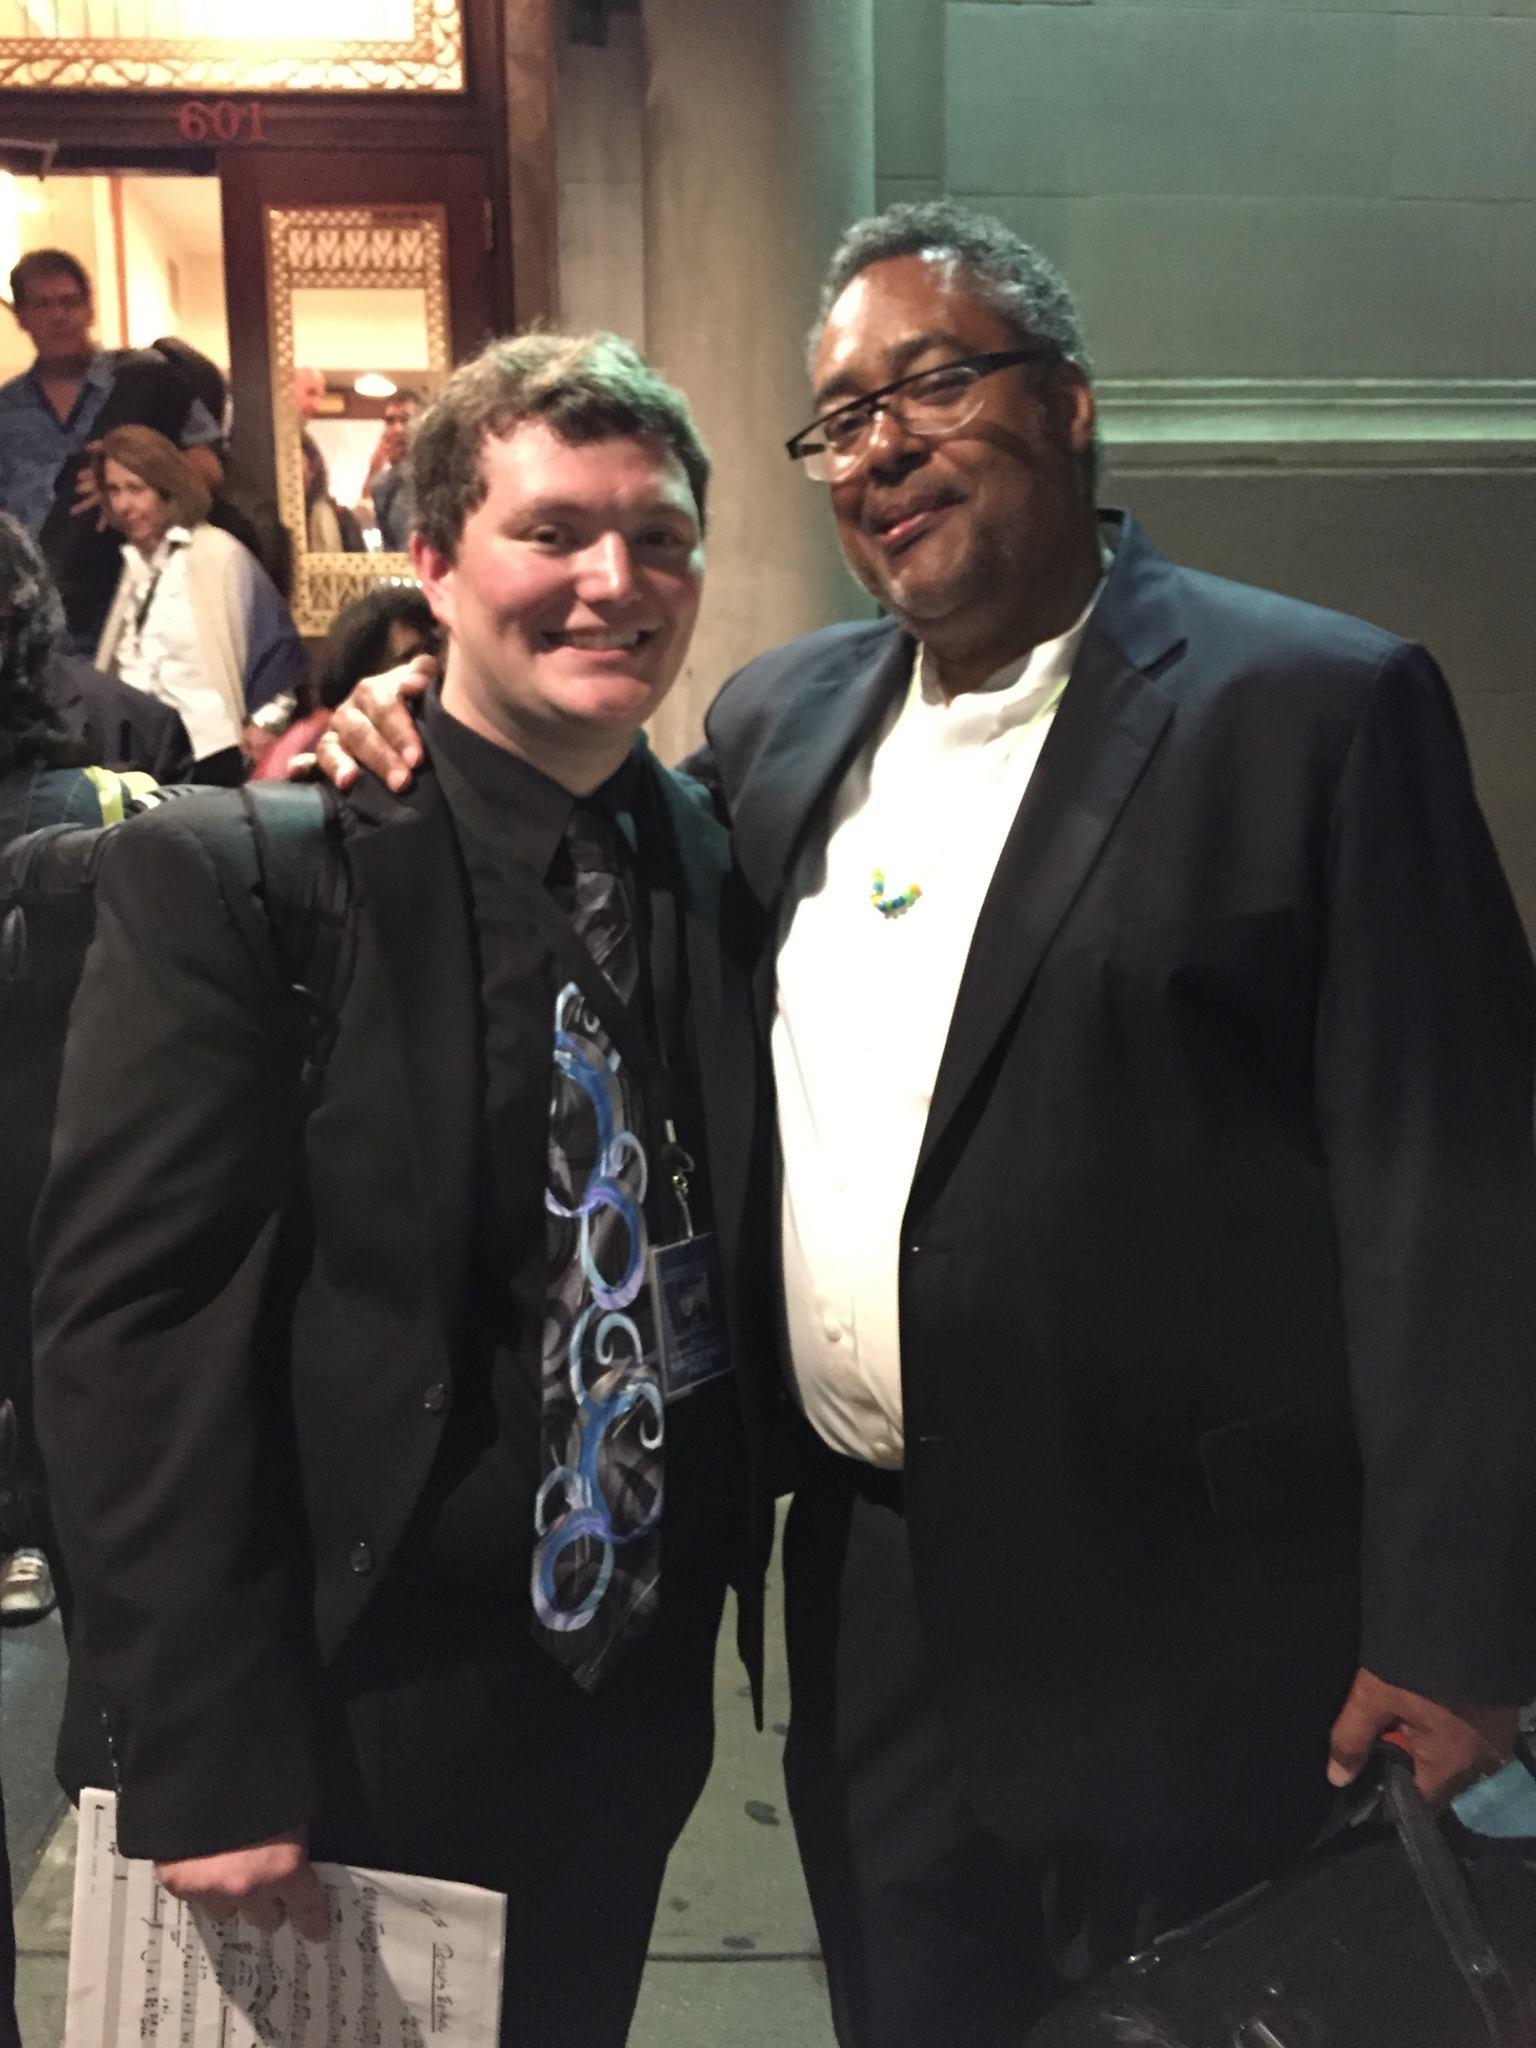 Brandon with Jon Faddis (Carnegie Hall Jazz Band, Thad Jones/Mel Lewis Orchestra)